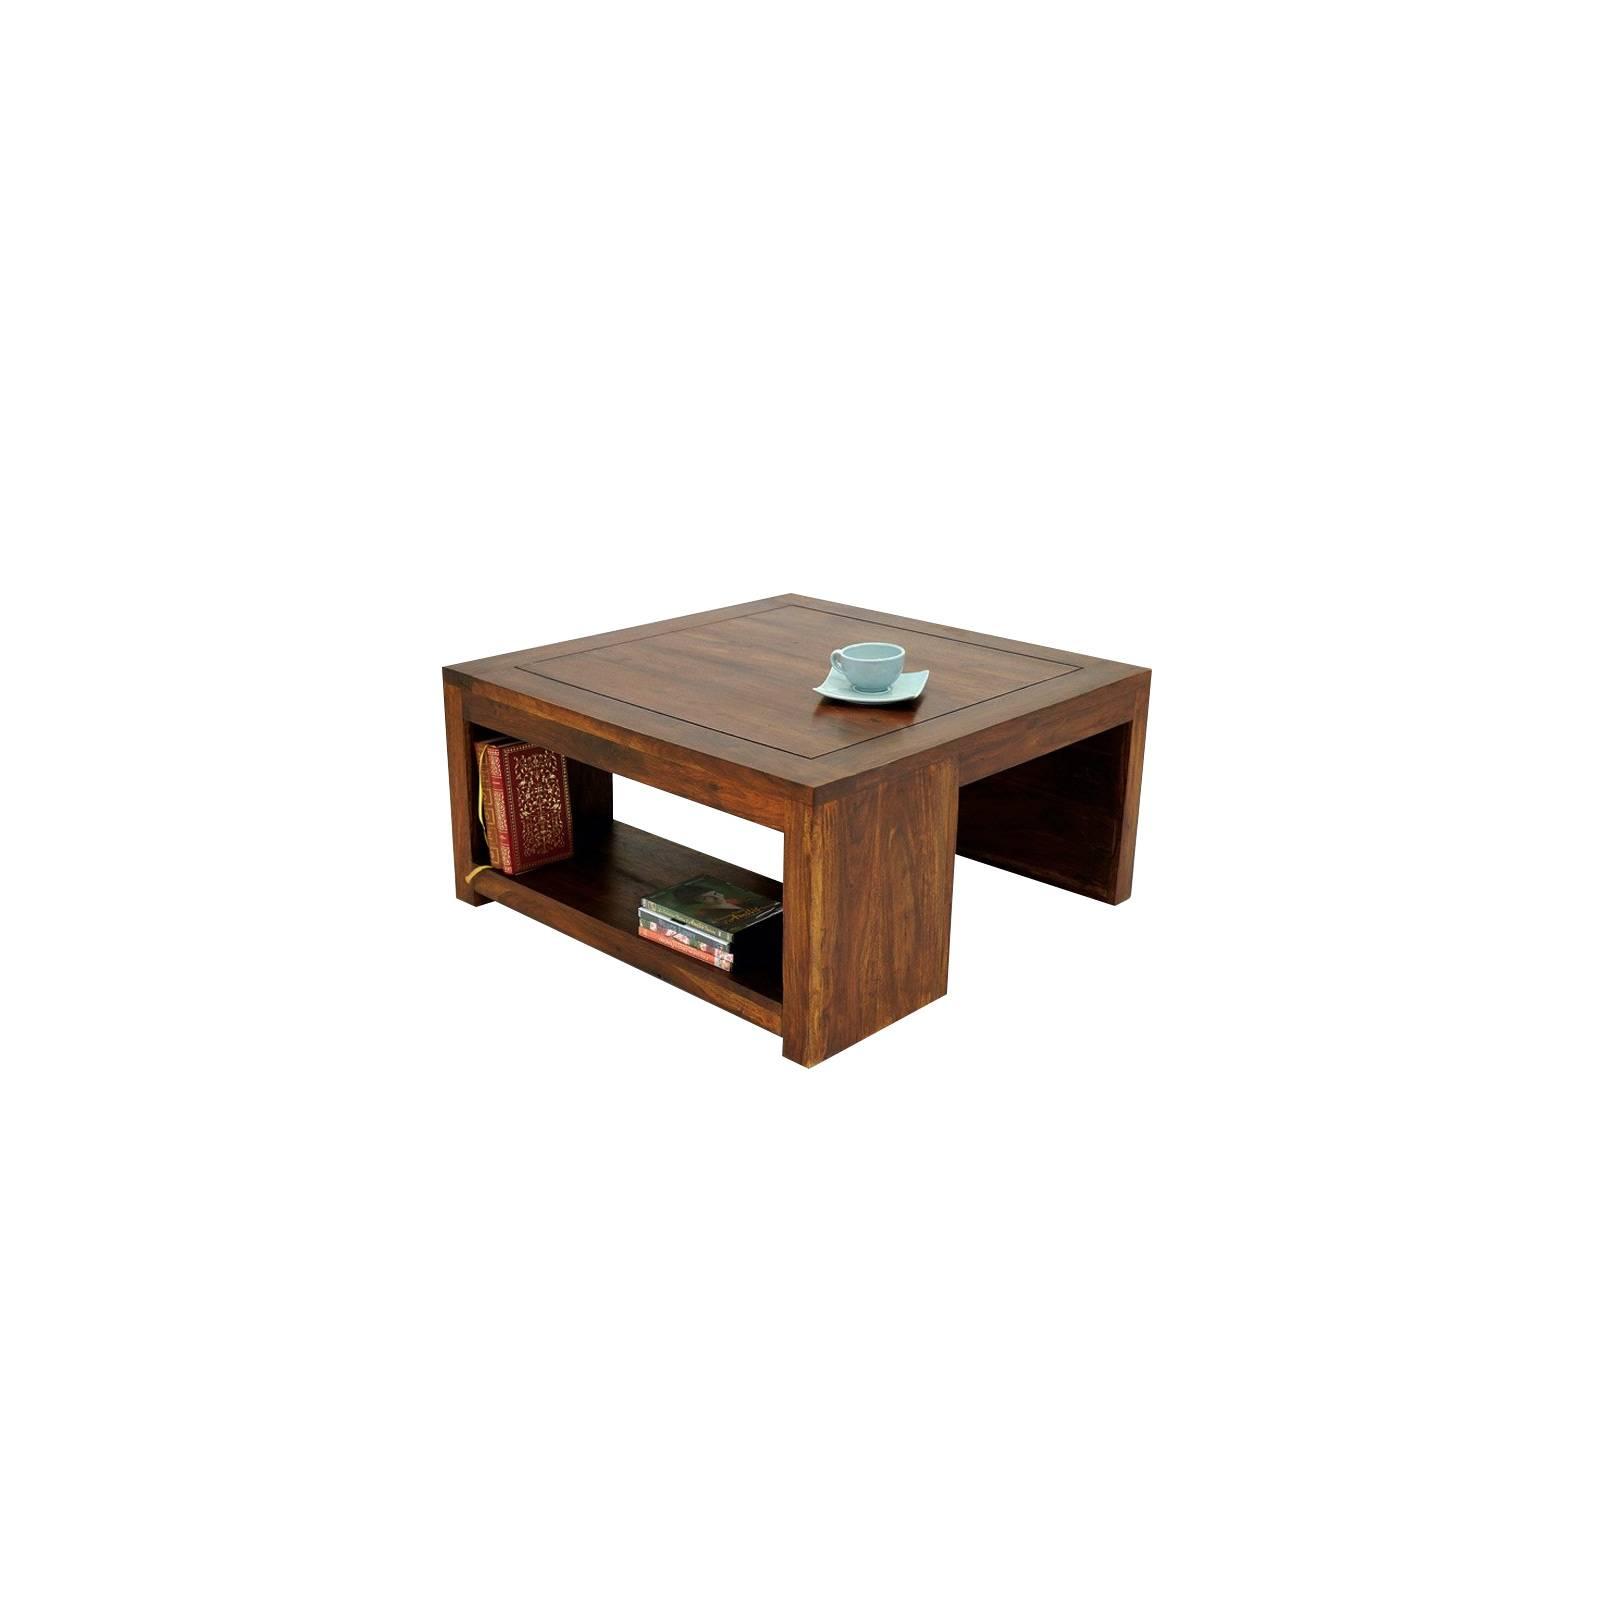 Table Basse PM Zen Palissandre - meuble en bois massif